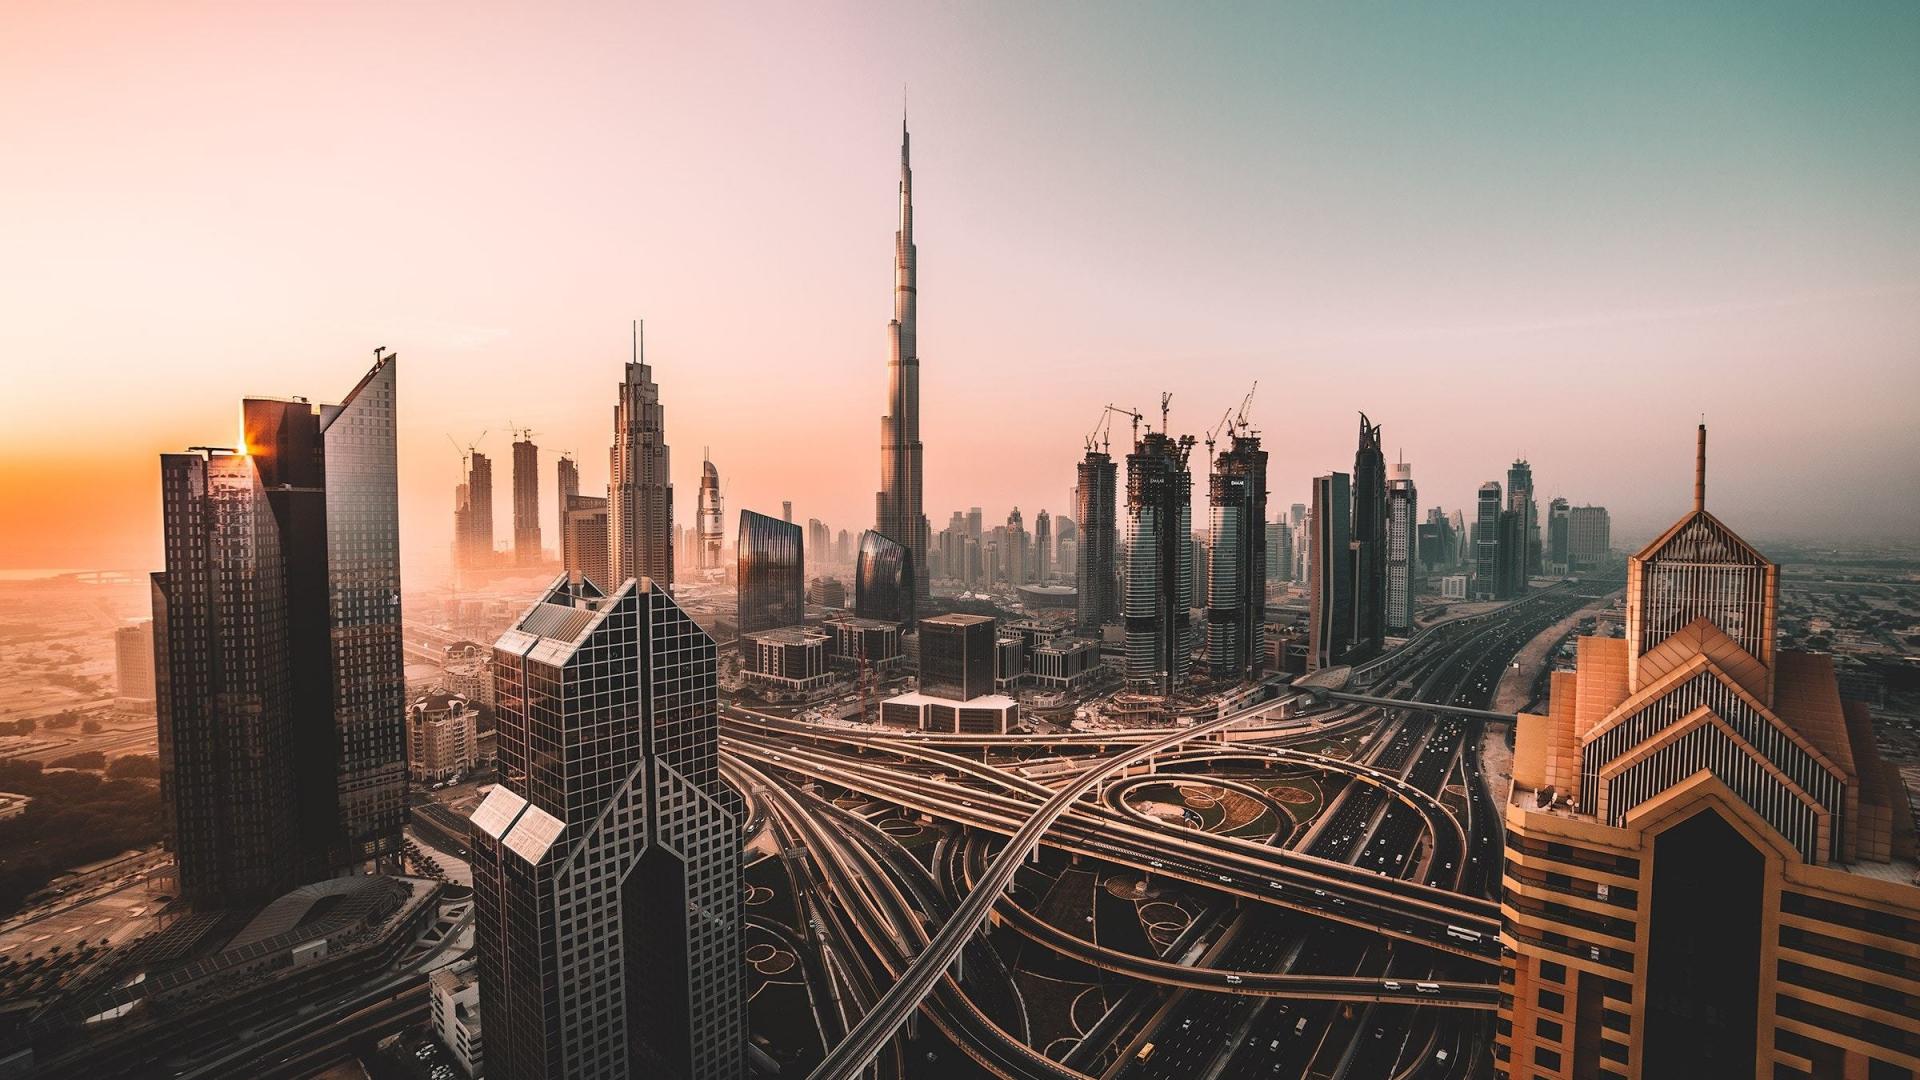 Download 1920x1080 wallpaper dubai skyline cityscape - Dubai burj khalifa hd wallpaper ...